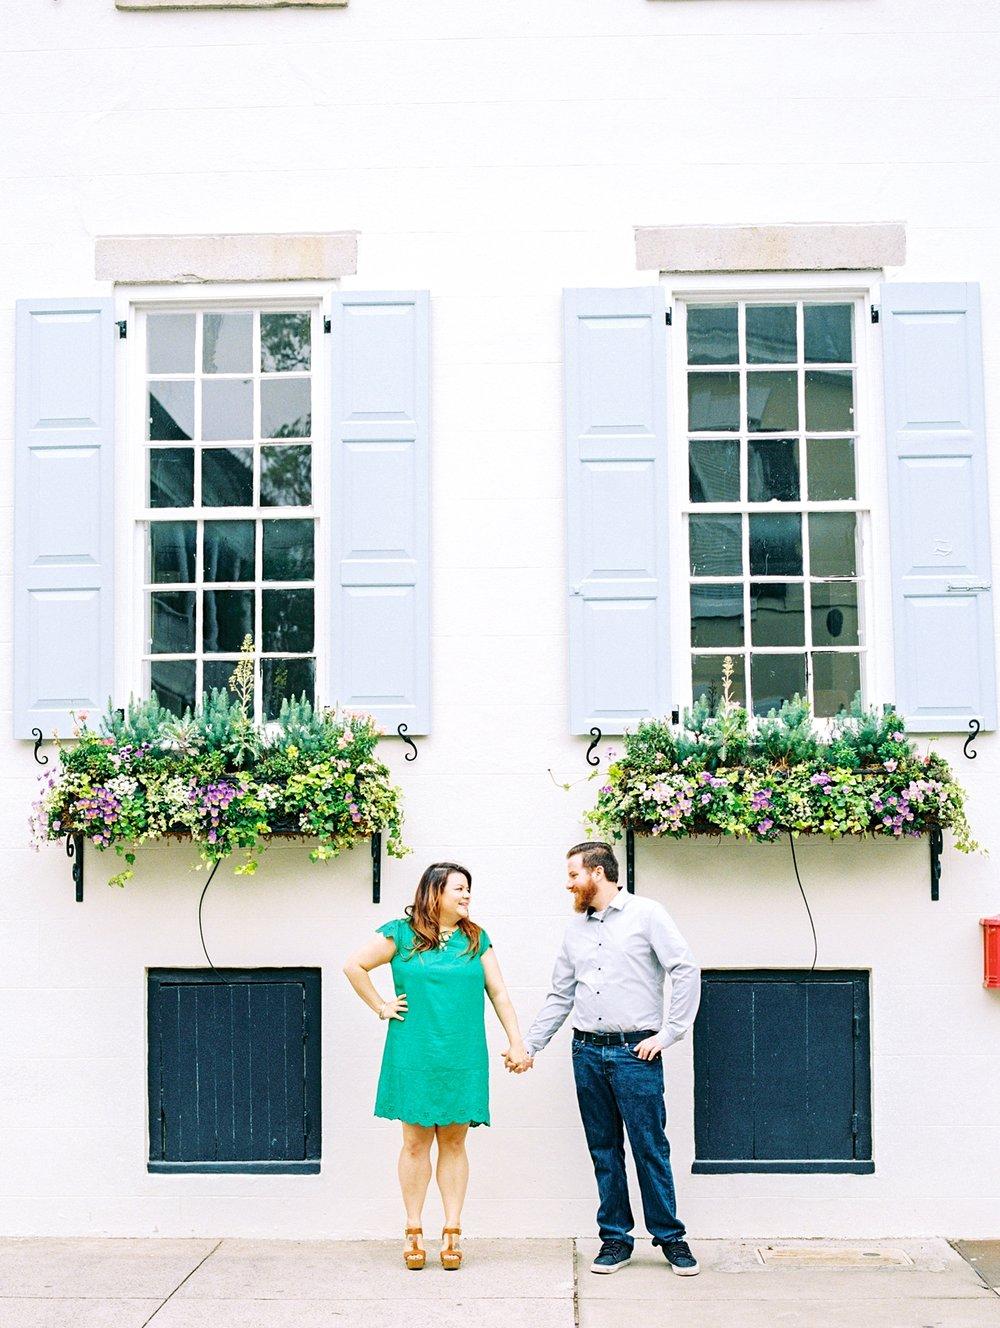 Lisa Silva Photography- Ponte Vedra Beach and Jacksonville, Florida Fine Art Film Wedding Photography- Engagement Session in Historic Charleston, South Carolina_0013.jpg